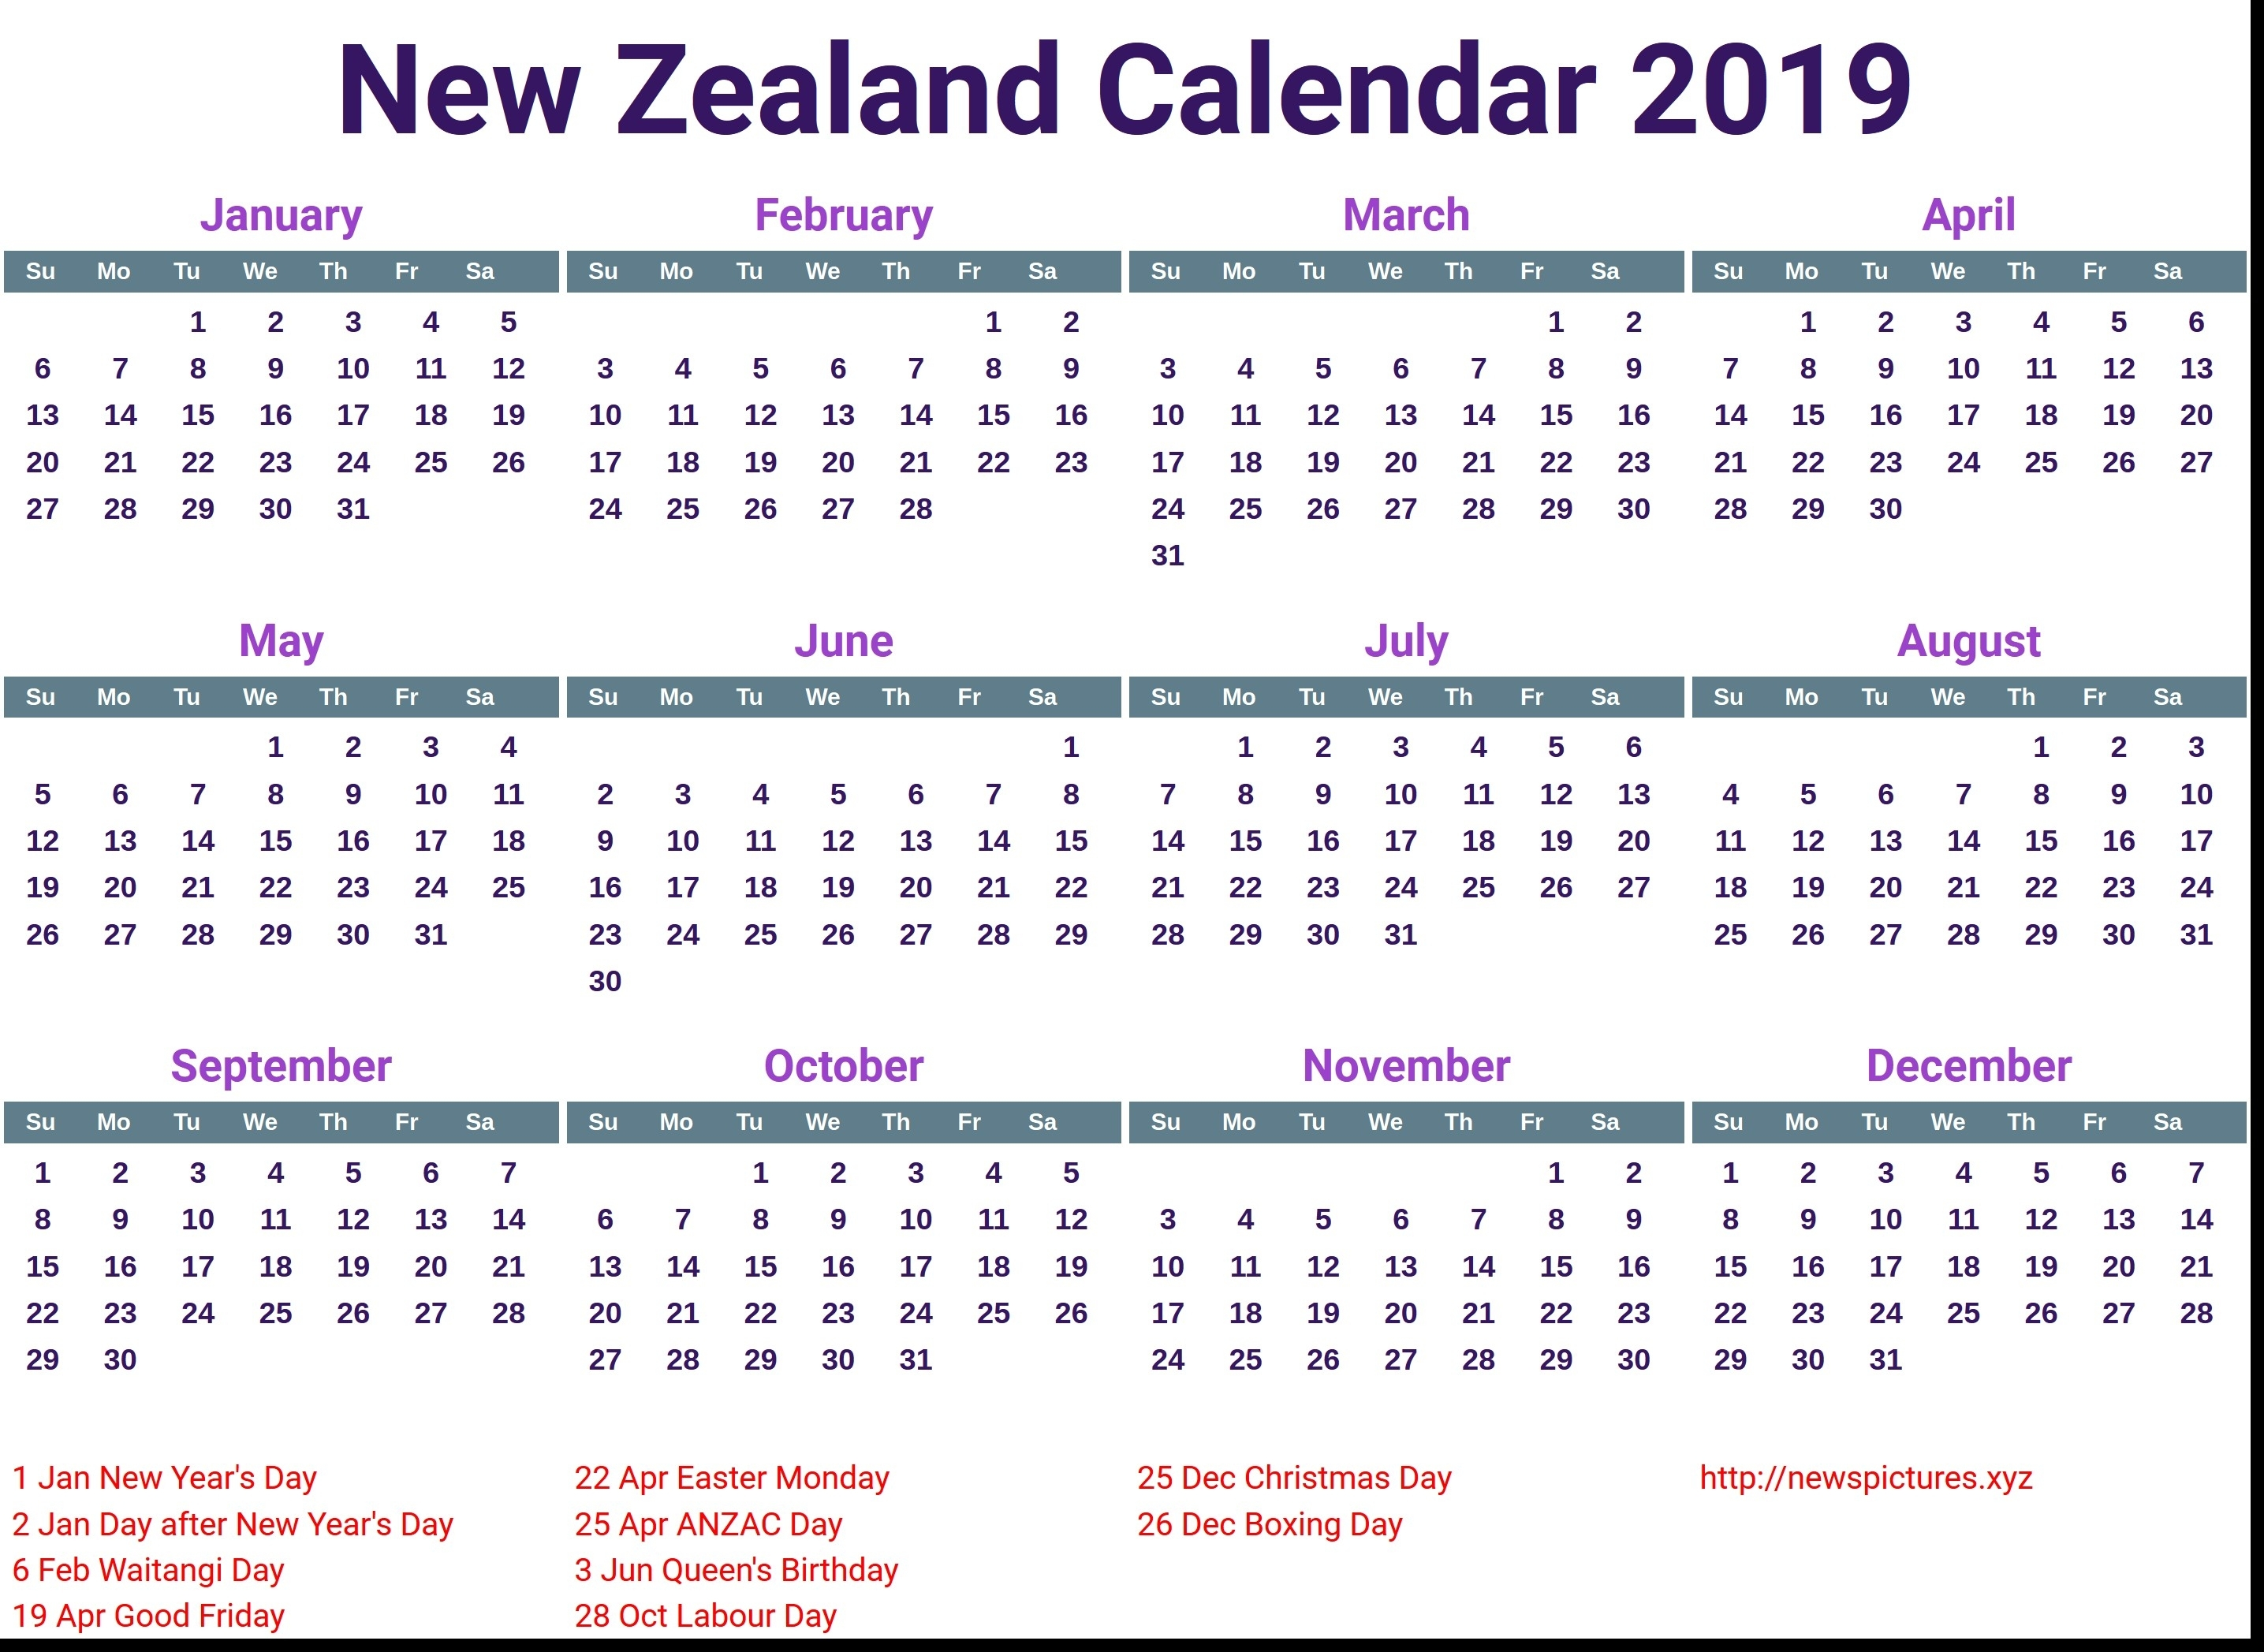 Extraordinary Calendar 2019 And 2020 Nz • Printable Blank Calendar in Uga 2019-2020Calendar